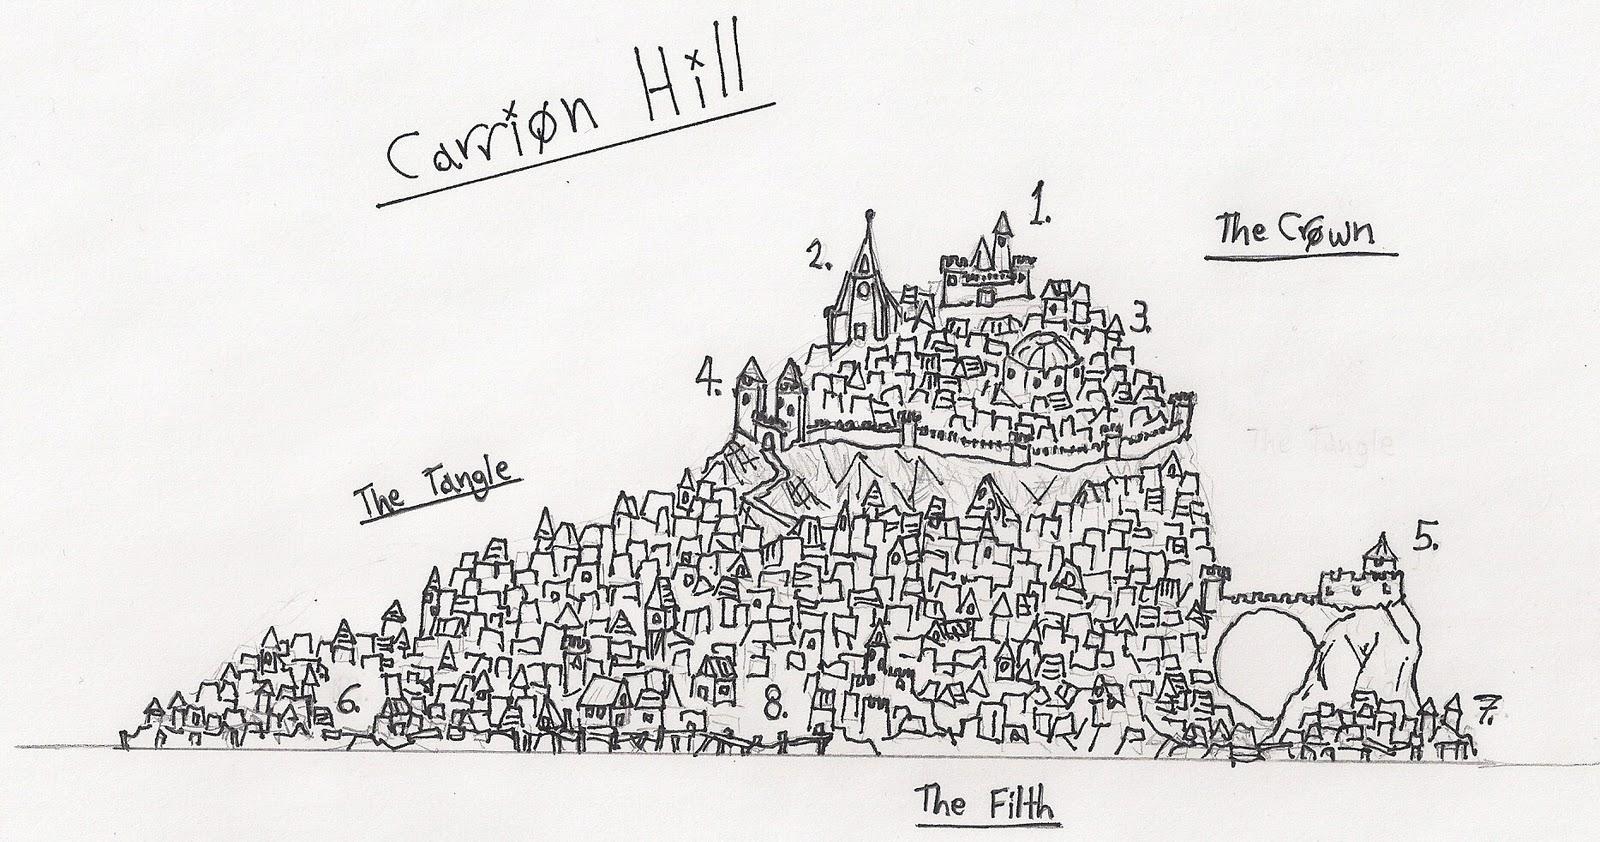 Carrion hillcross